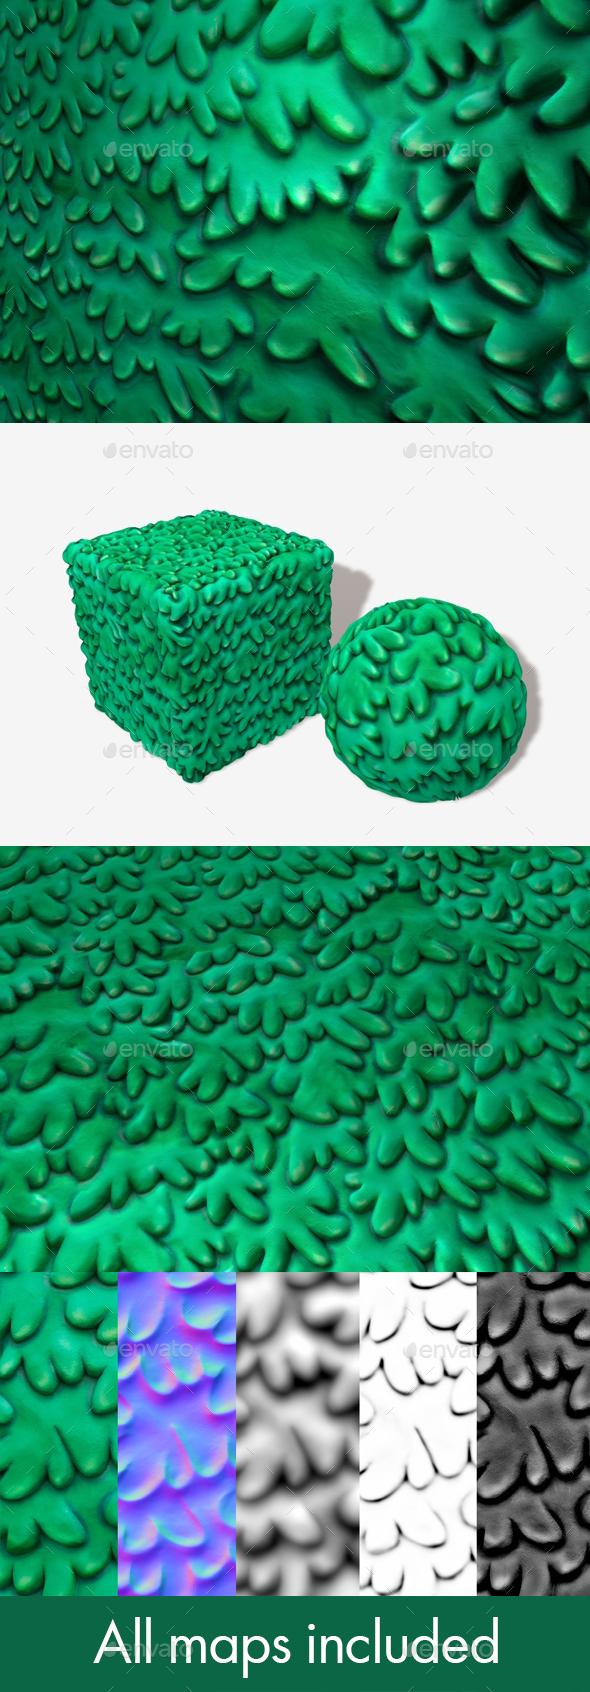 3DOcean Toon Shrubbery Seamless Texture 19671546